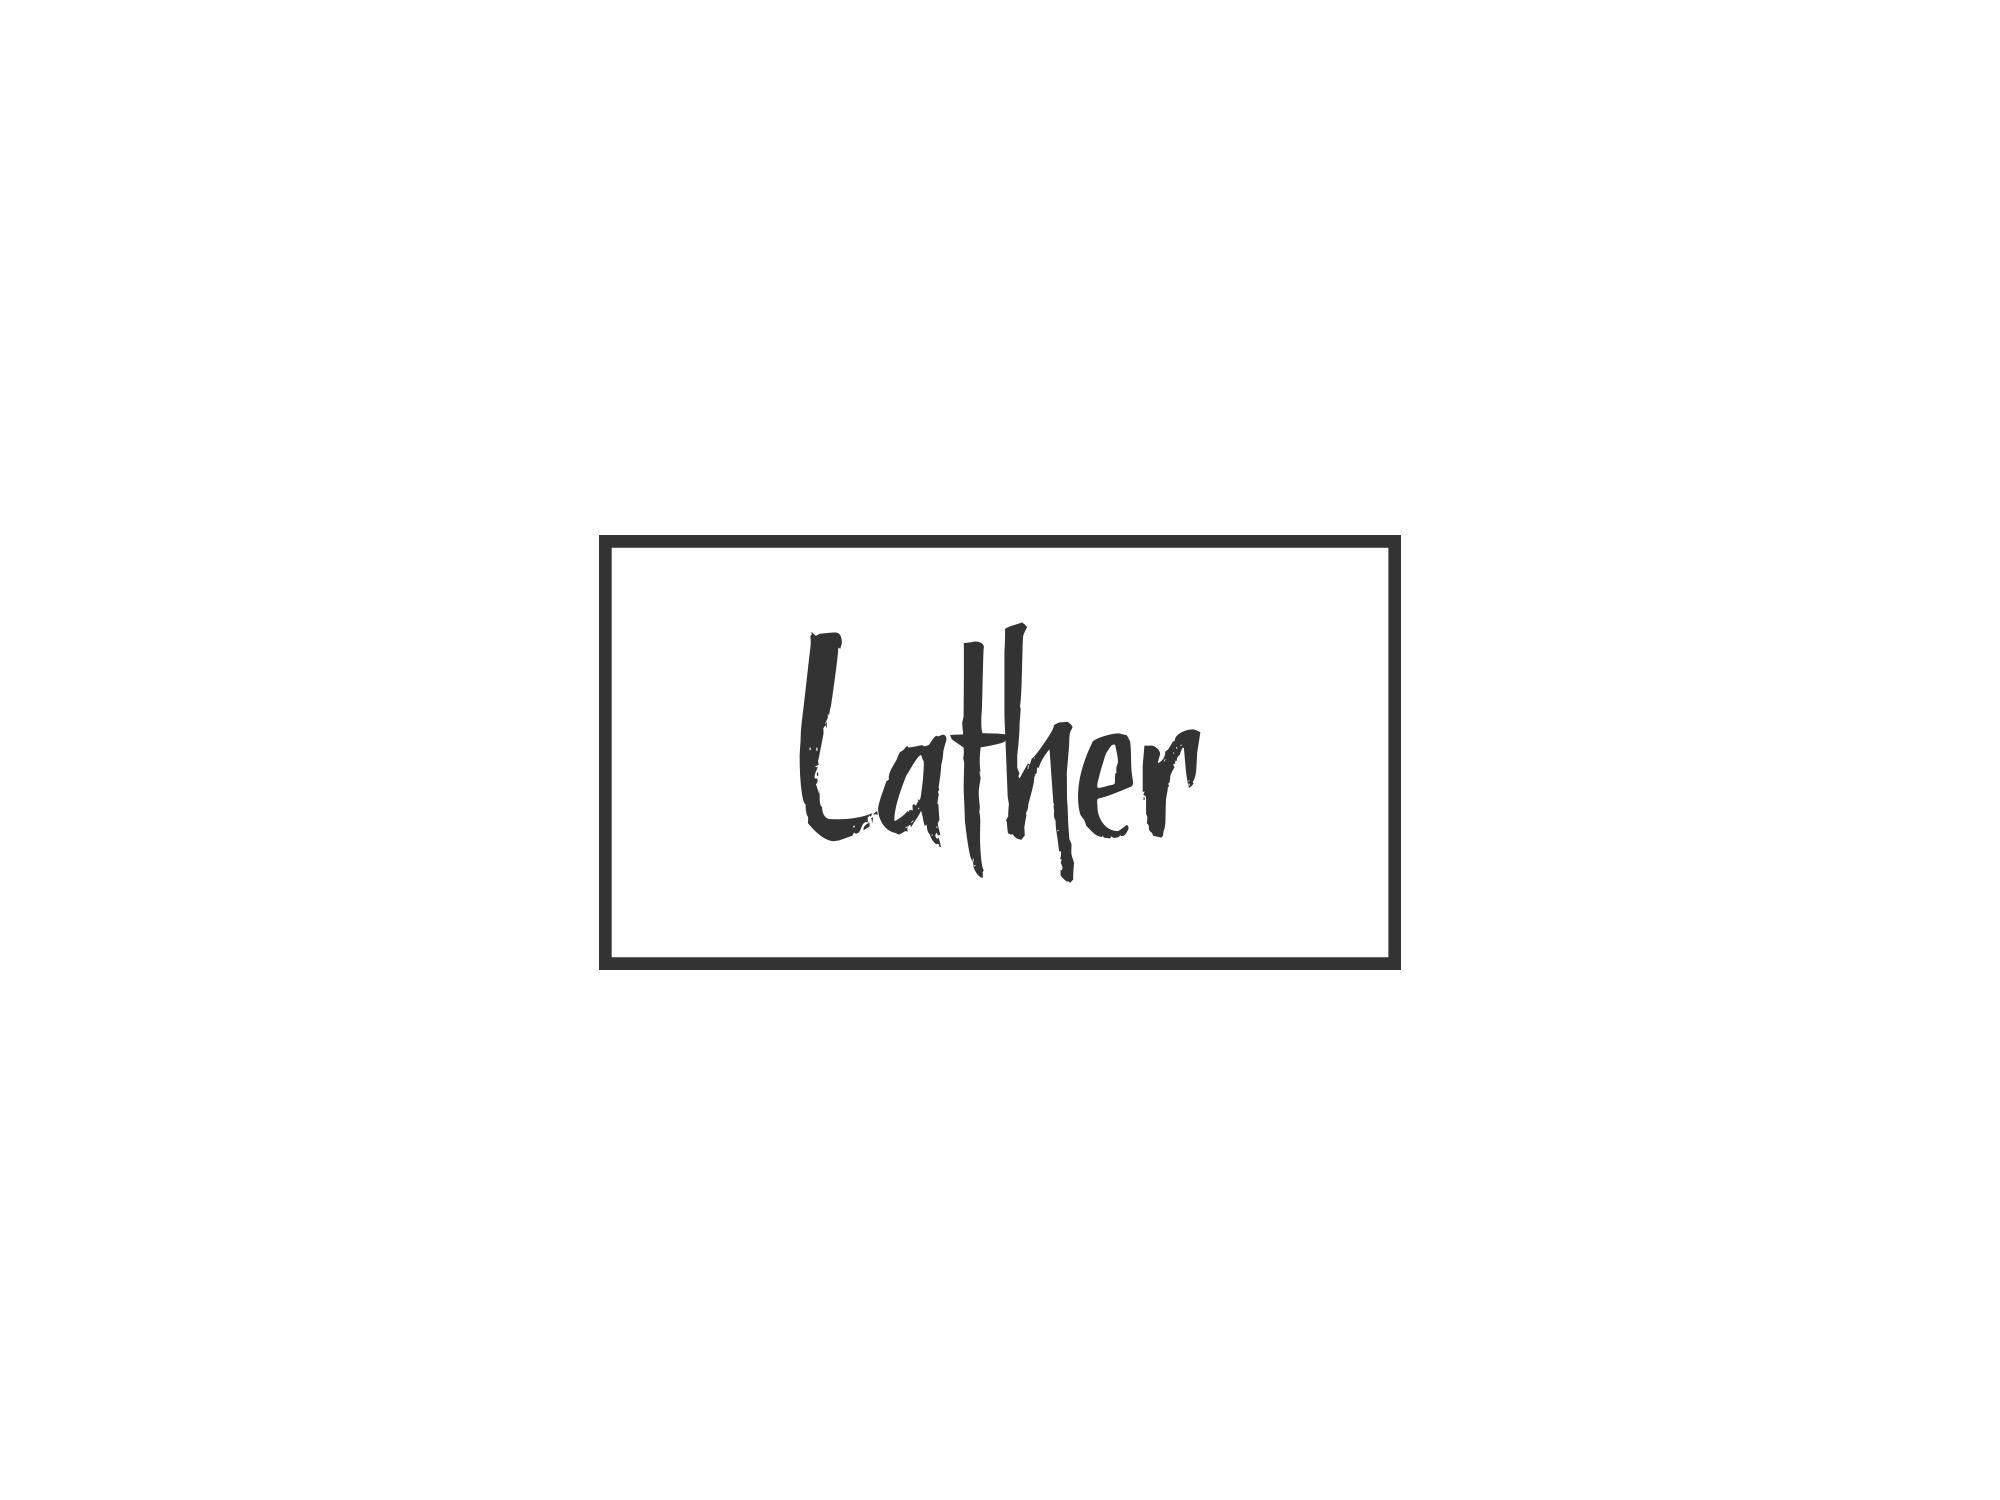 logo-gallery-lather1.jpg